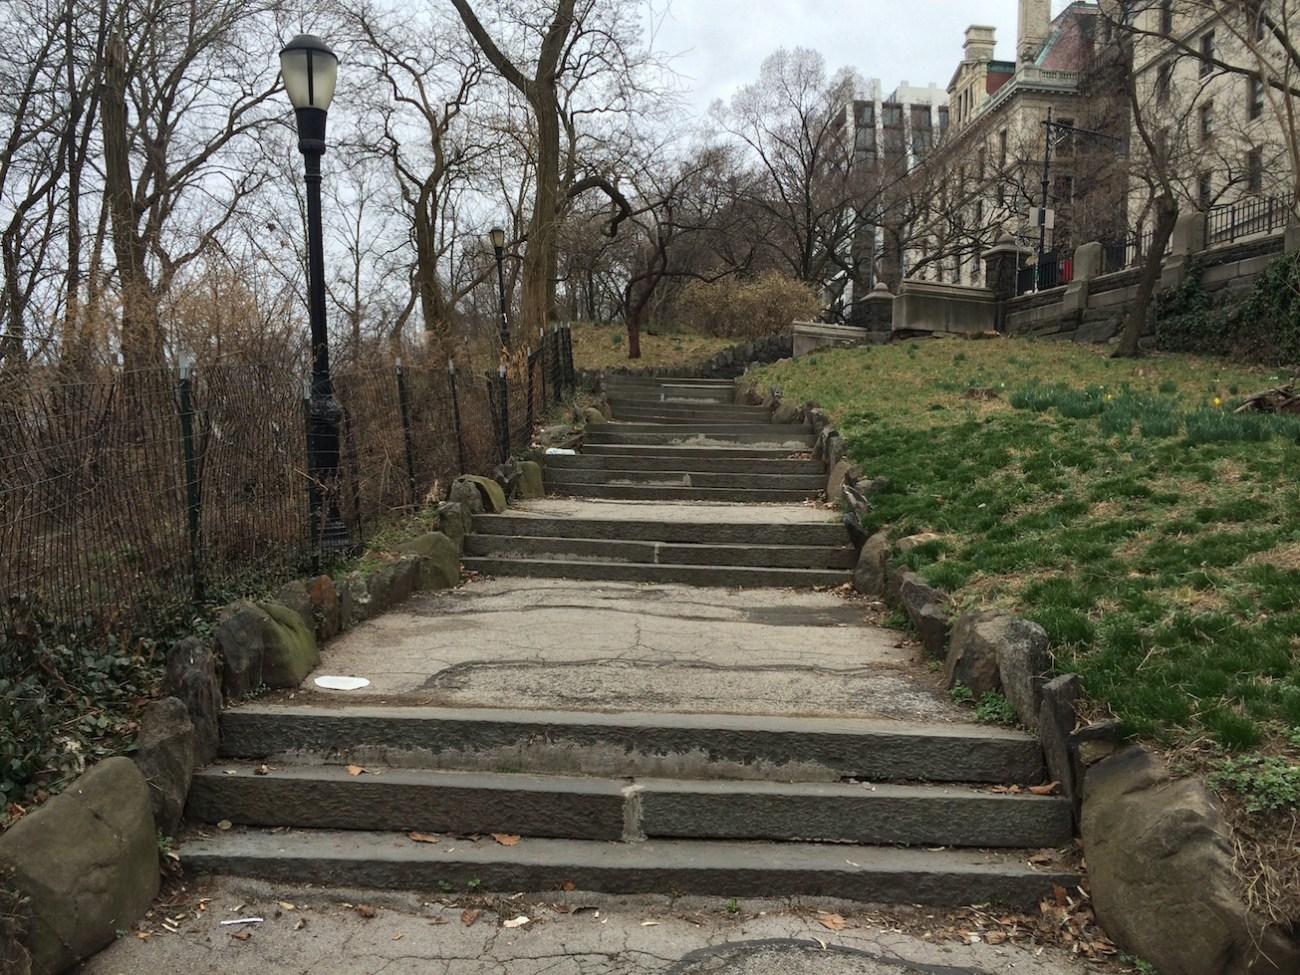 Morningside Park Stair Workout 12